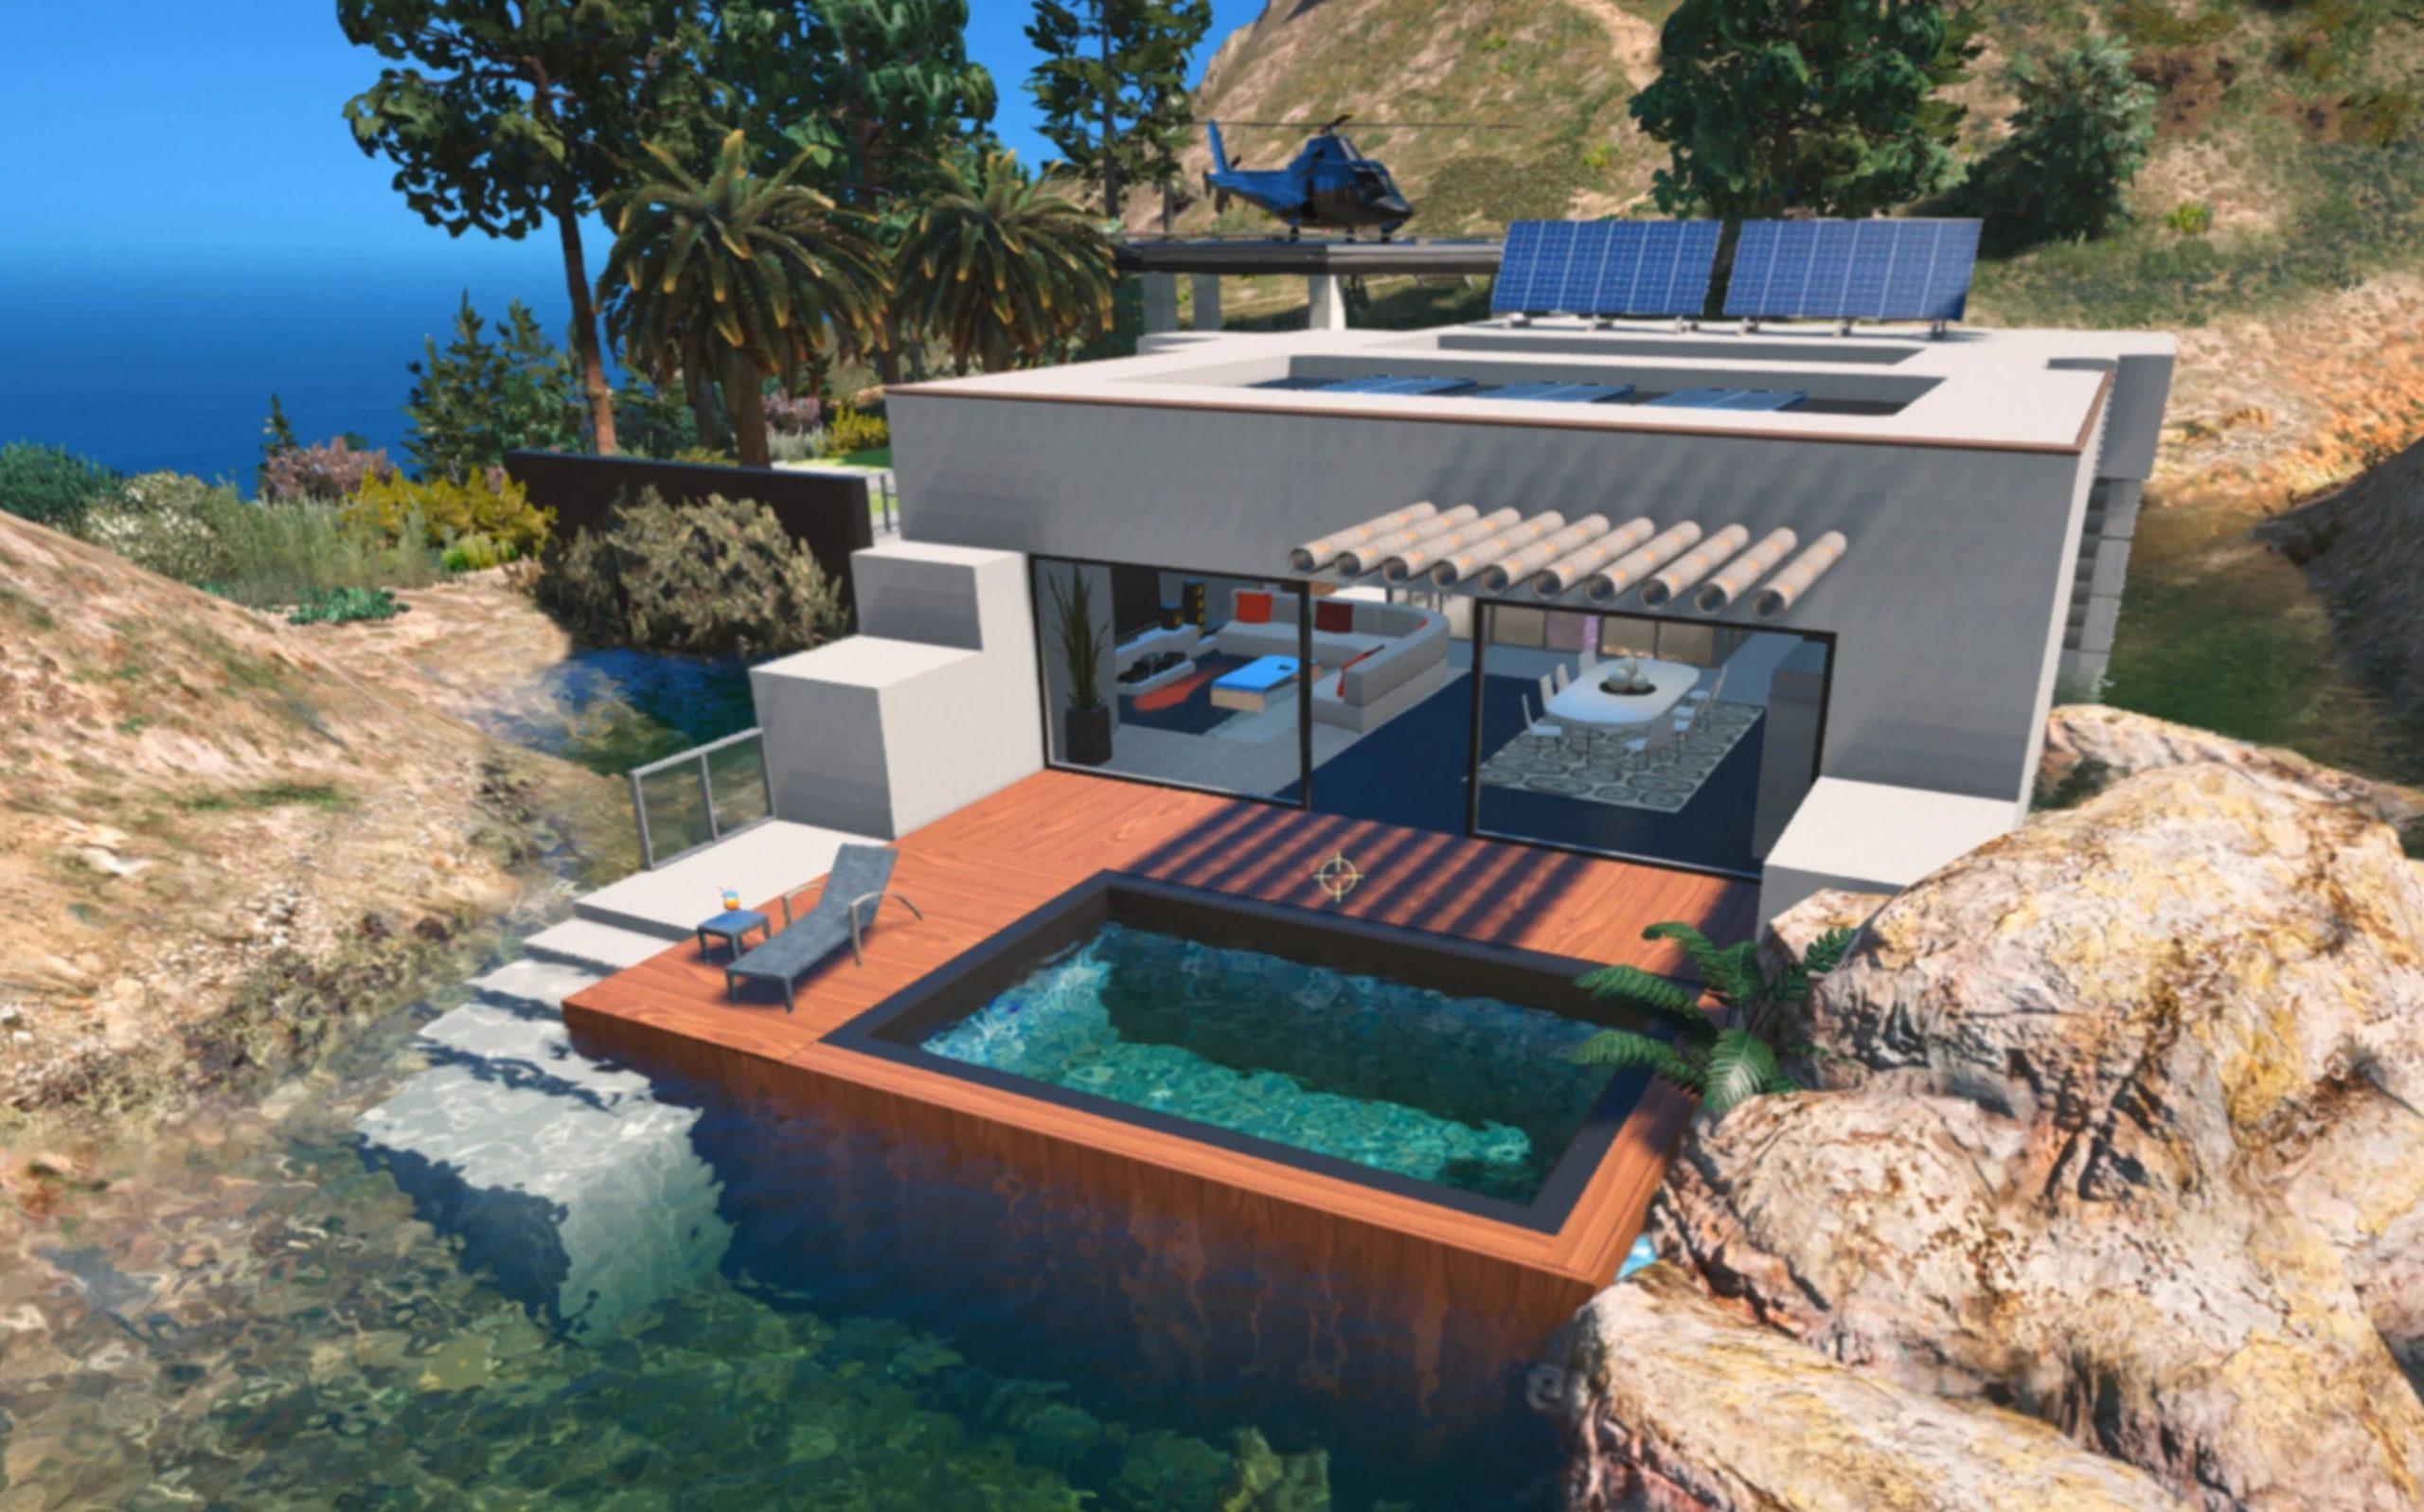 Small Villa [YMAP / MapEditor] 2.0